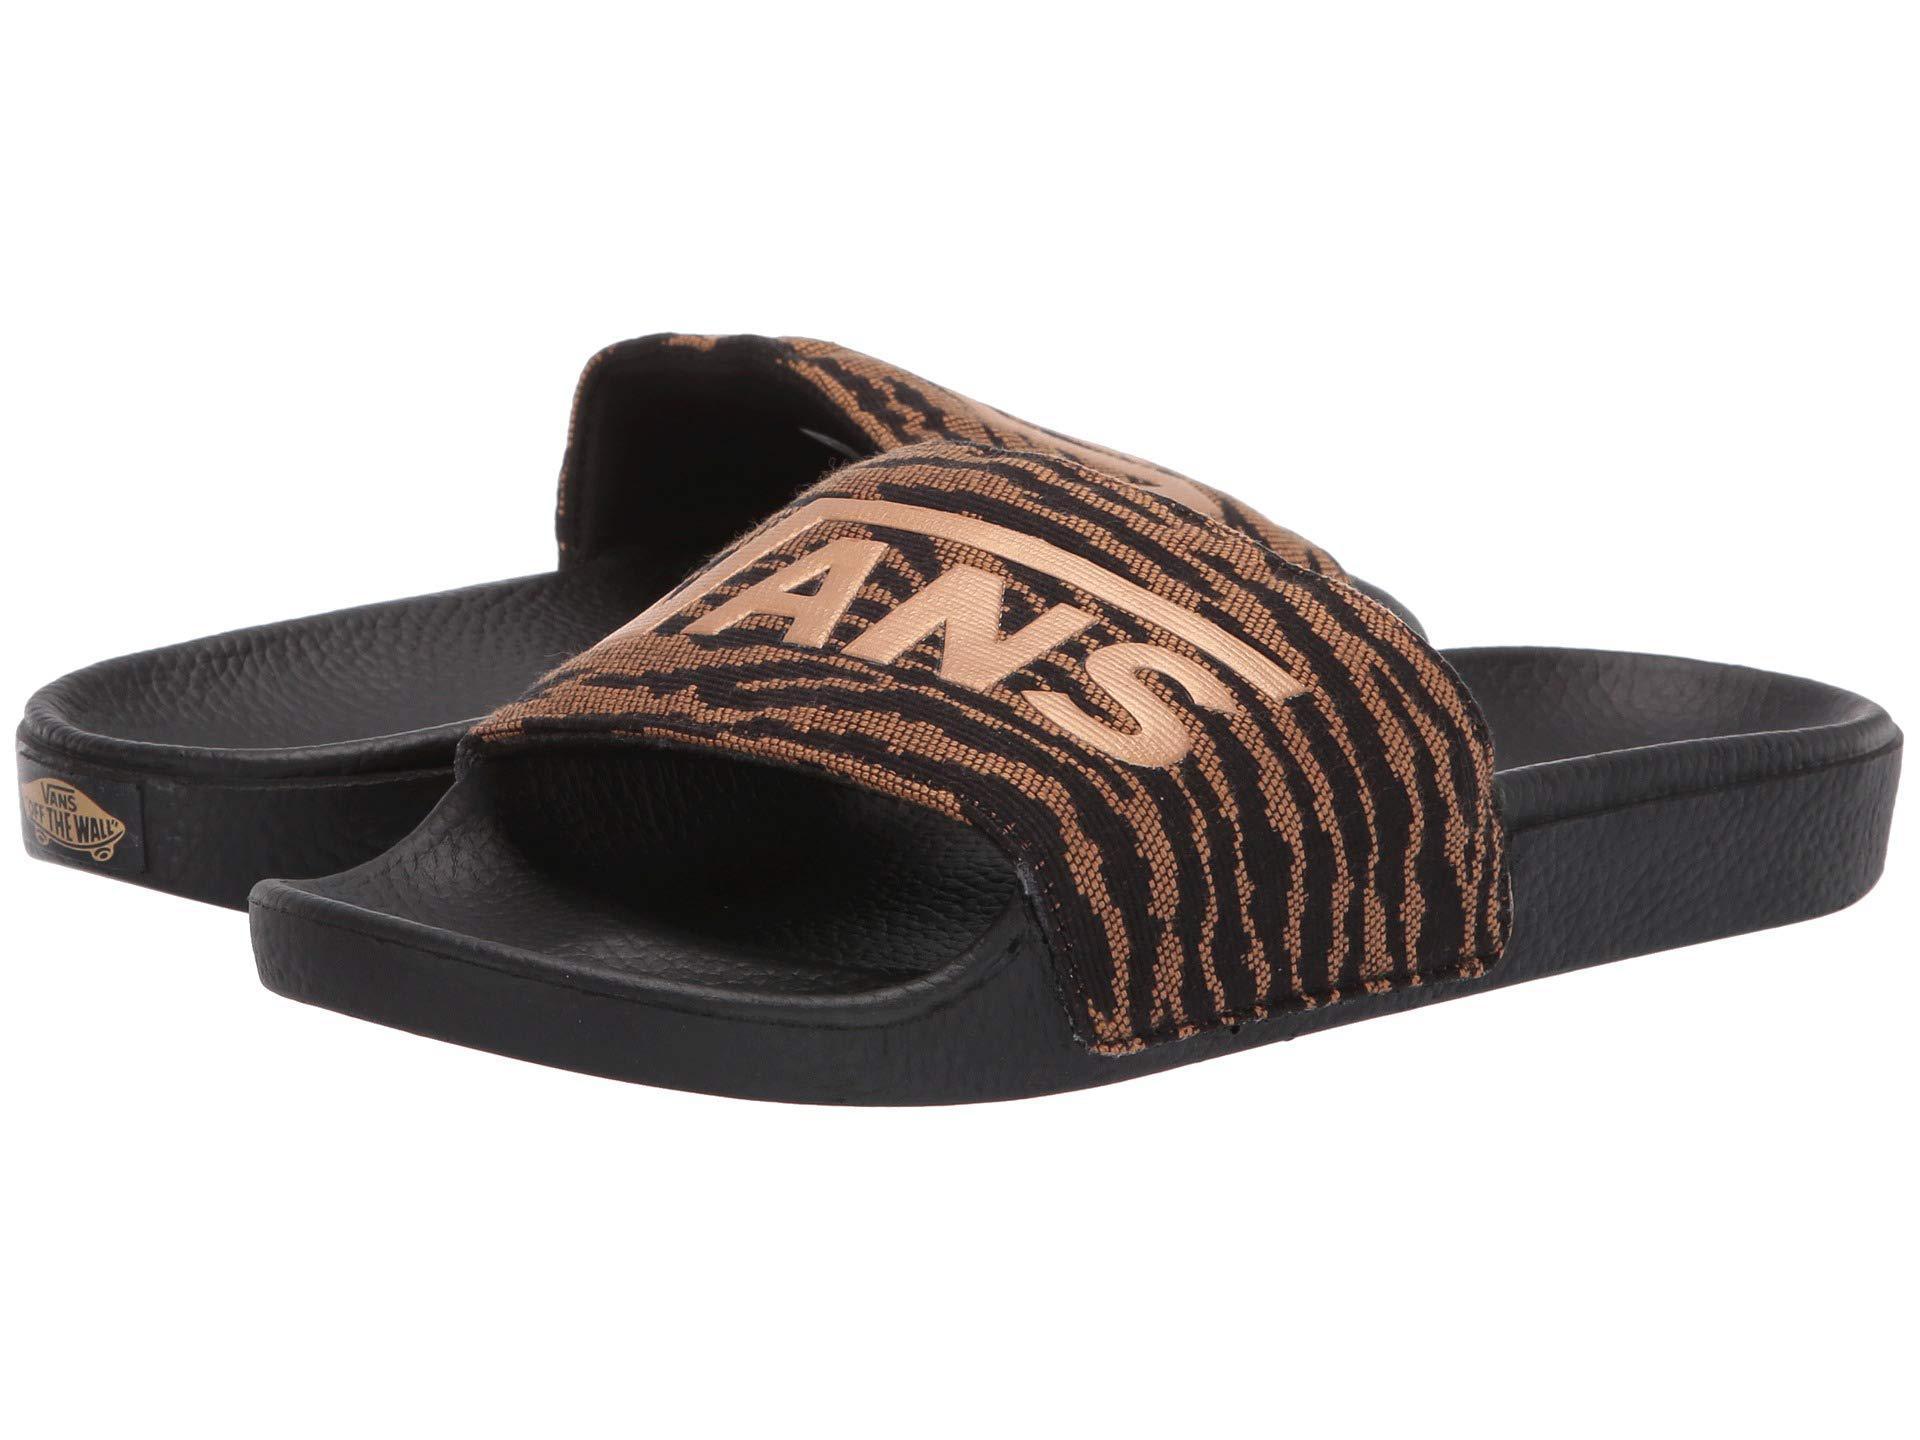 6e5bd9ca1f6310 Lyst - Vans Slide-on (() Black) Women s Sandals in Black